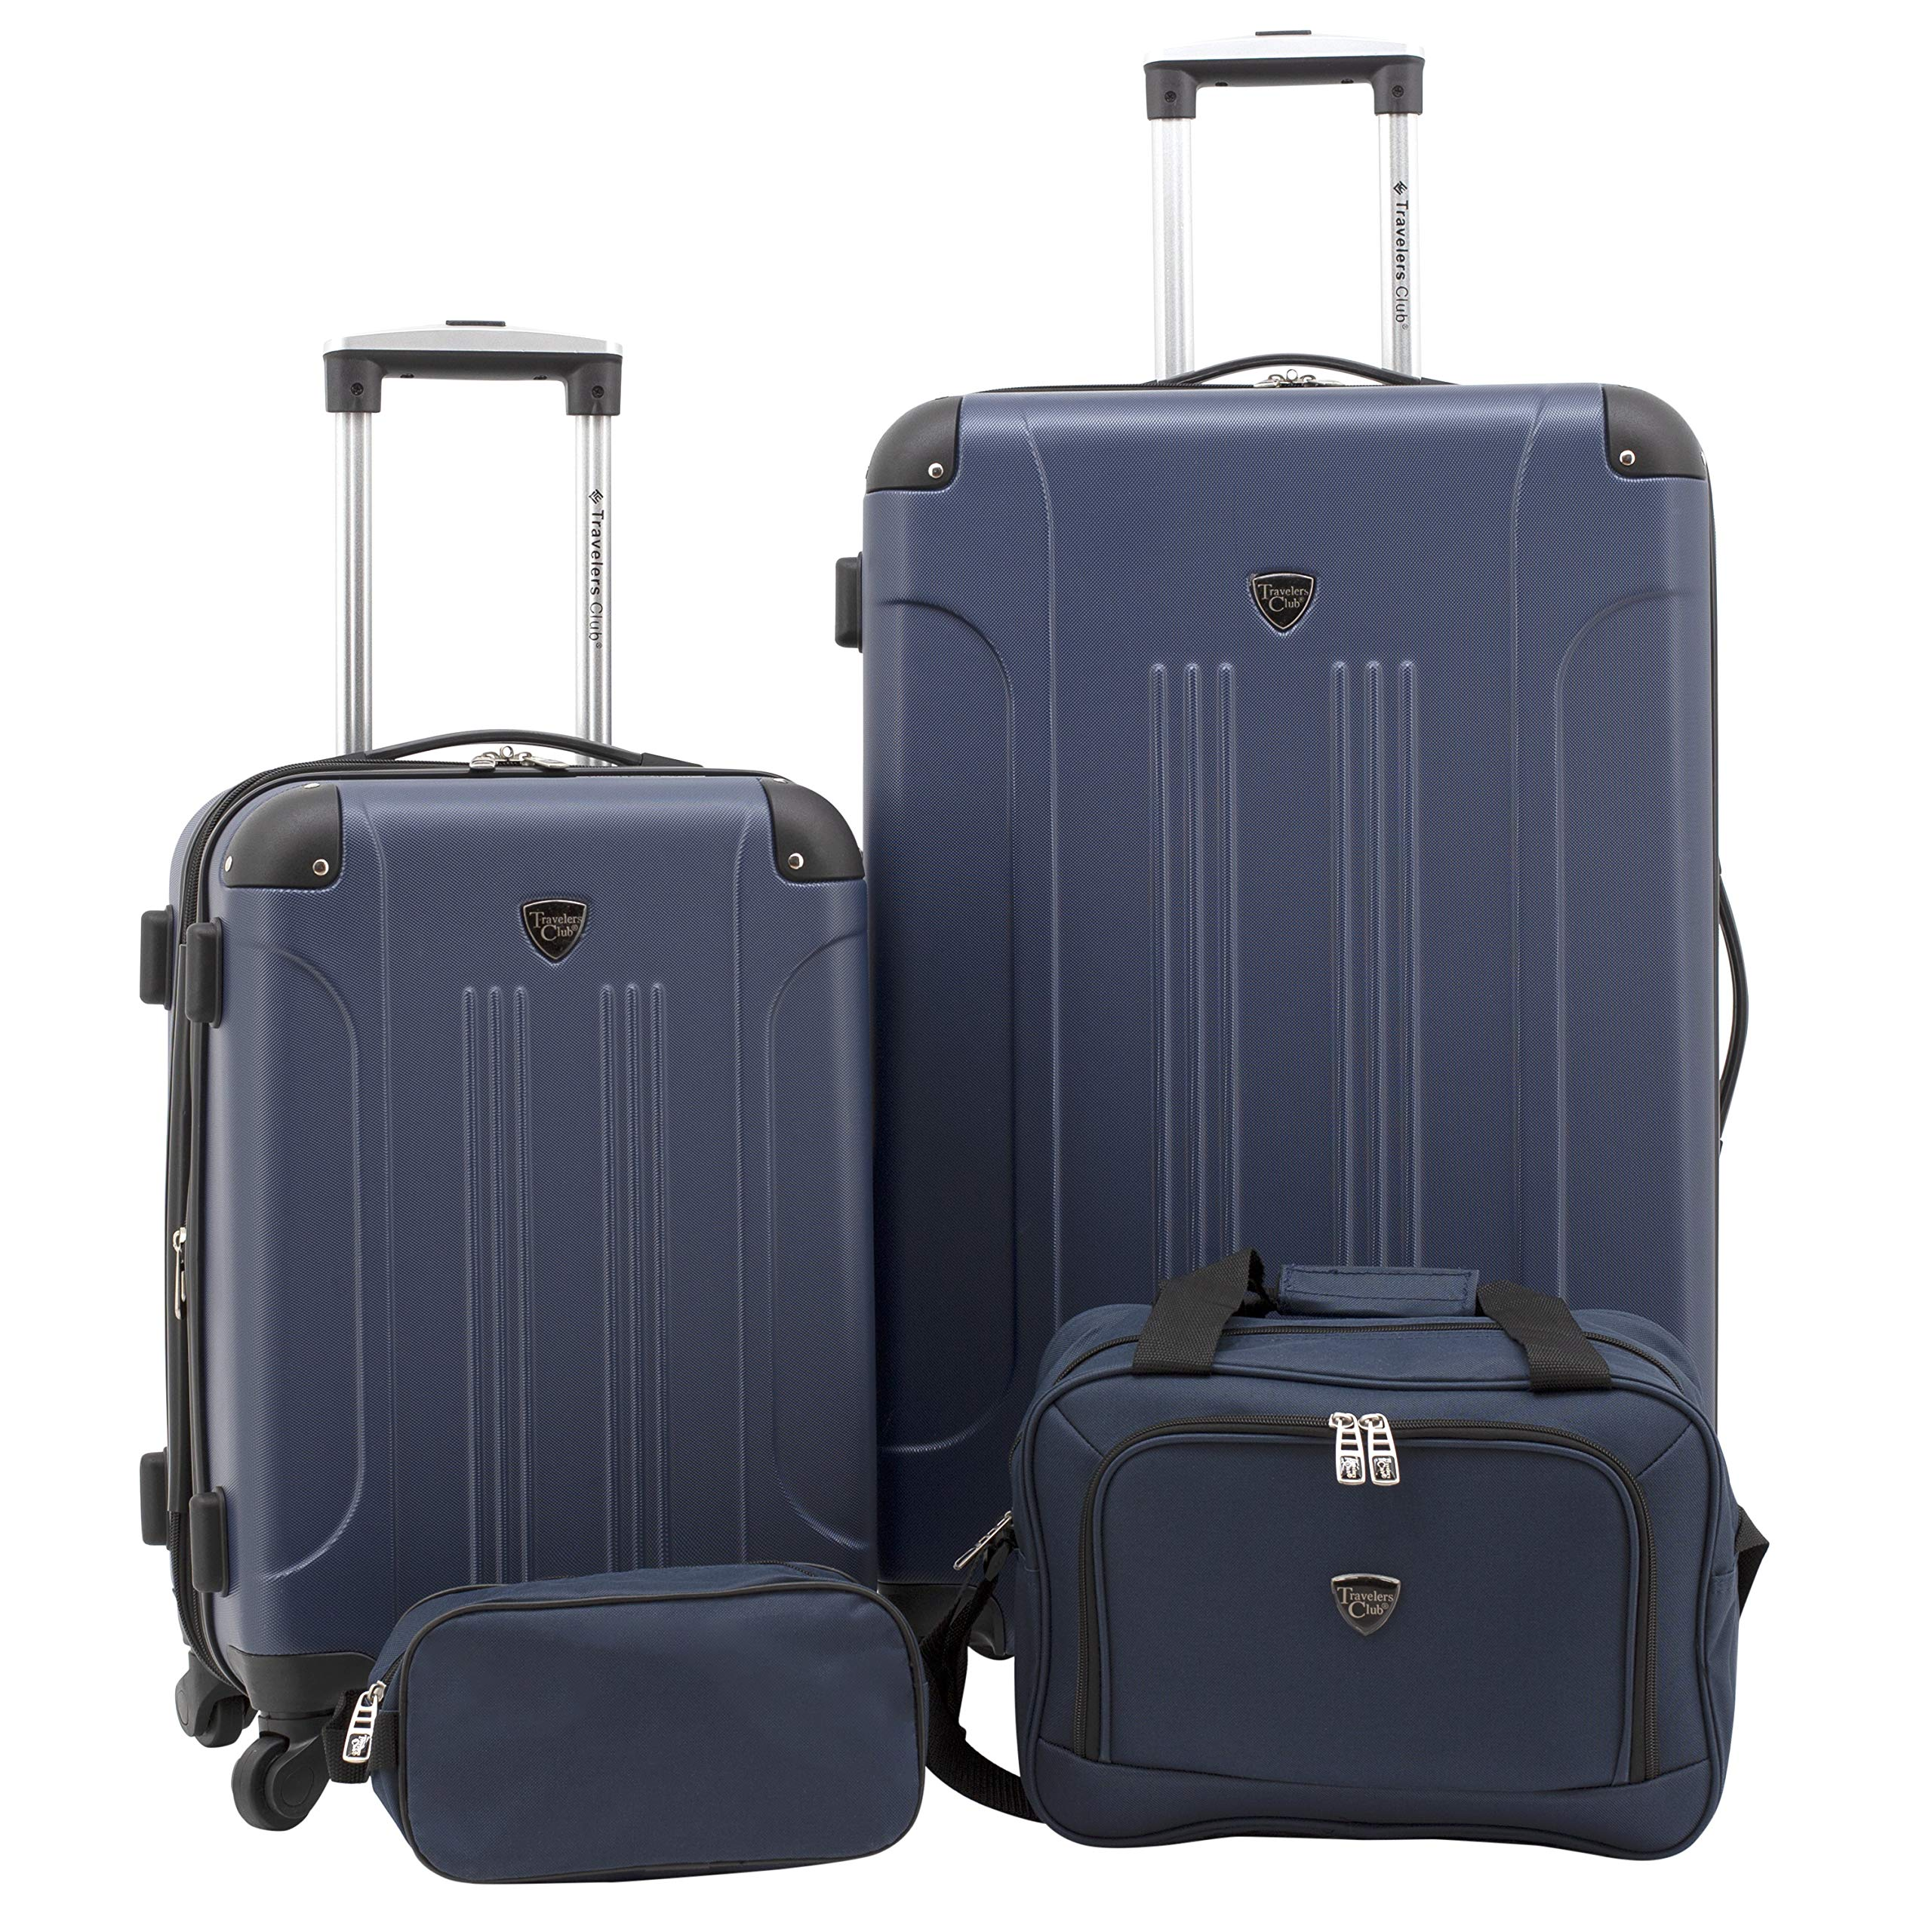 Travelers Club Luggage 4 PC Set, Navy Blue by Traveler's Club